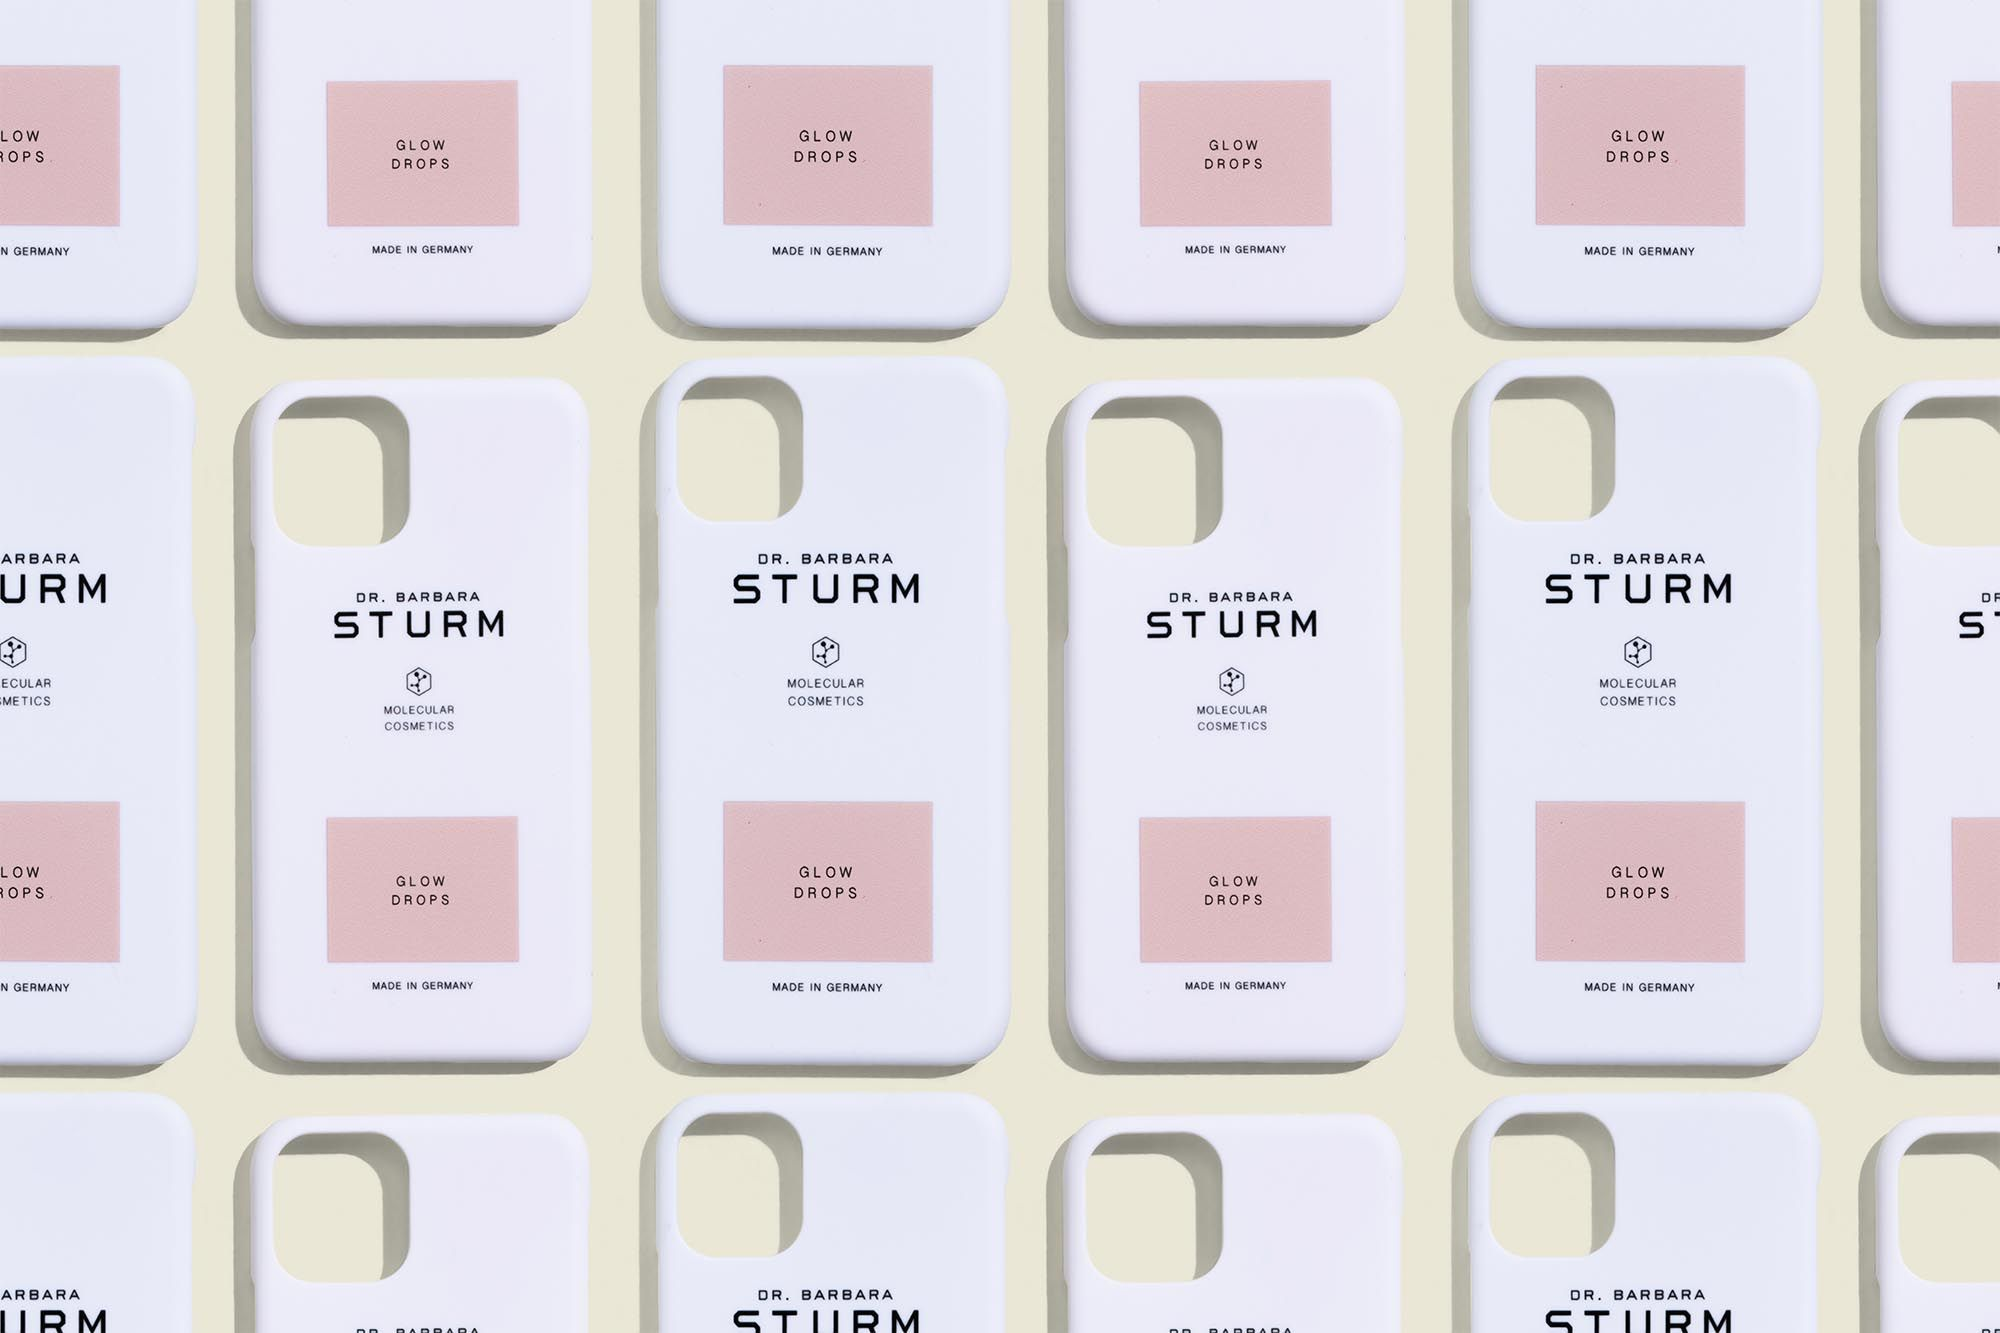 White Sturm iPhone cases